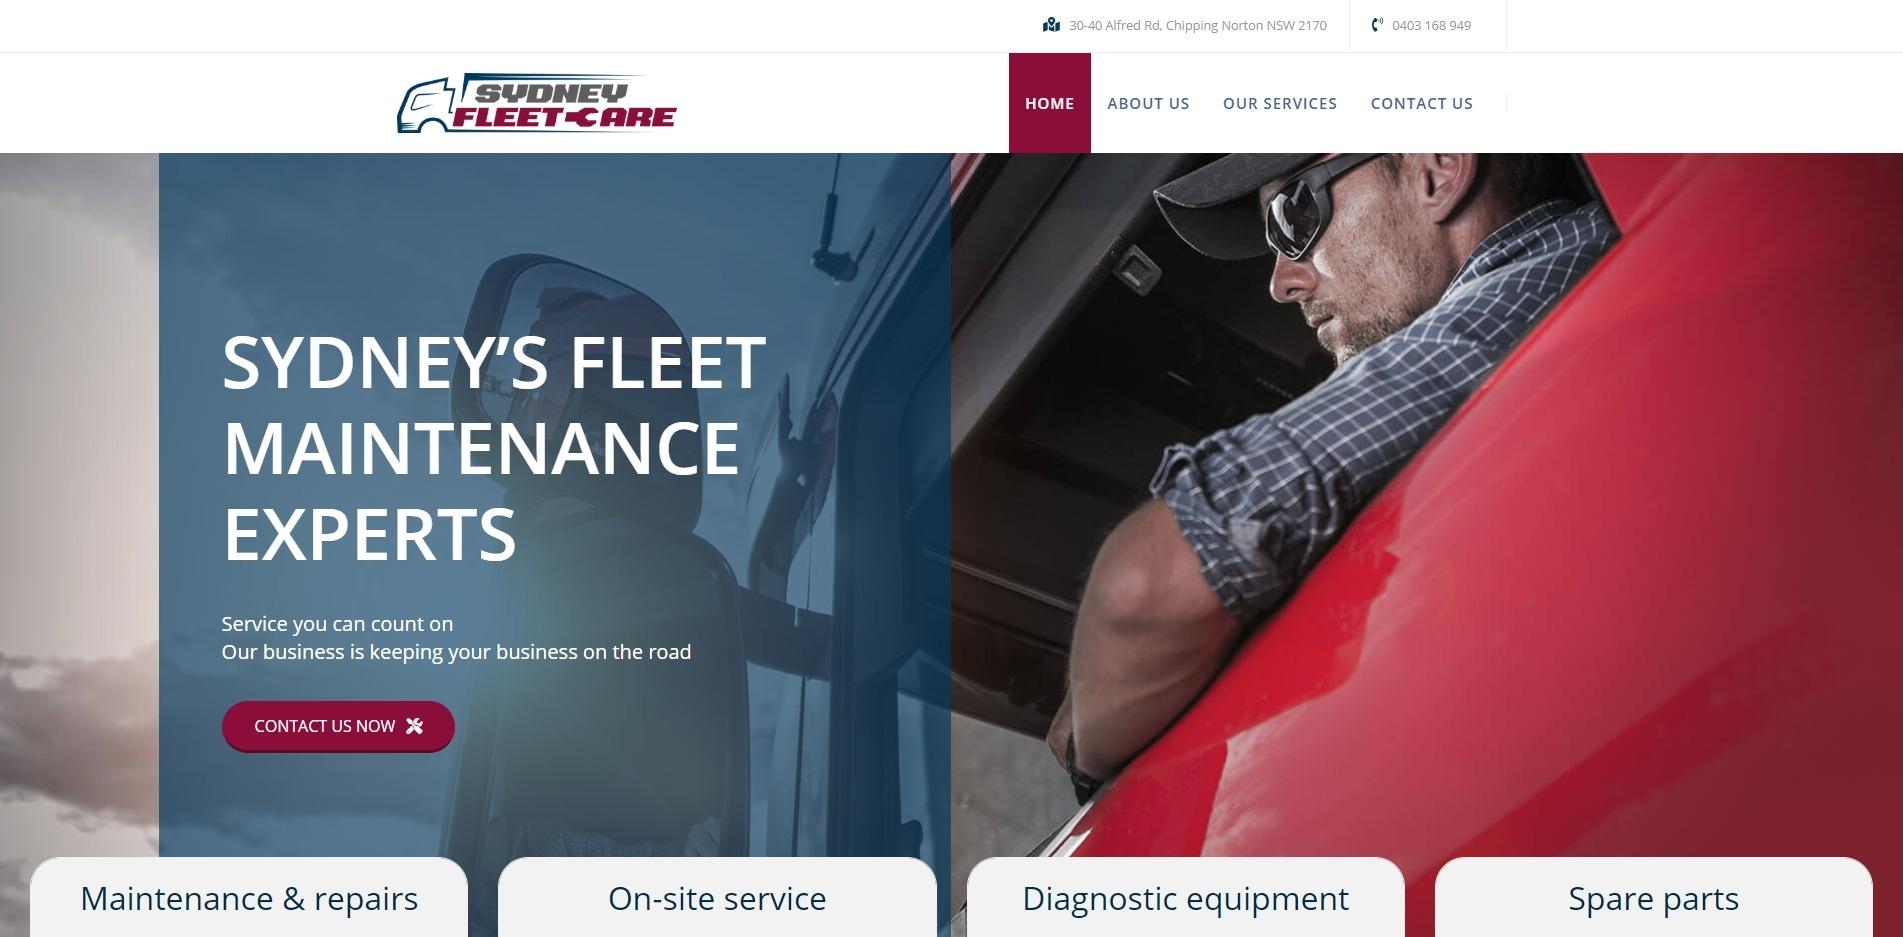 Website Design Sydney Fleet care